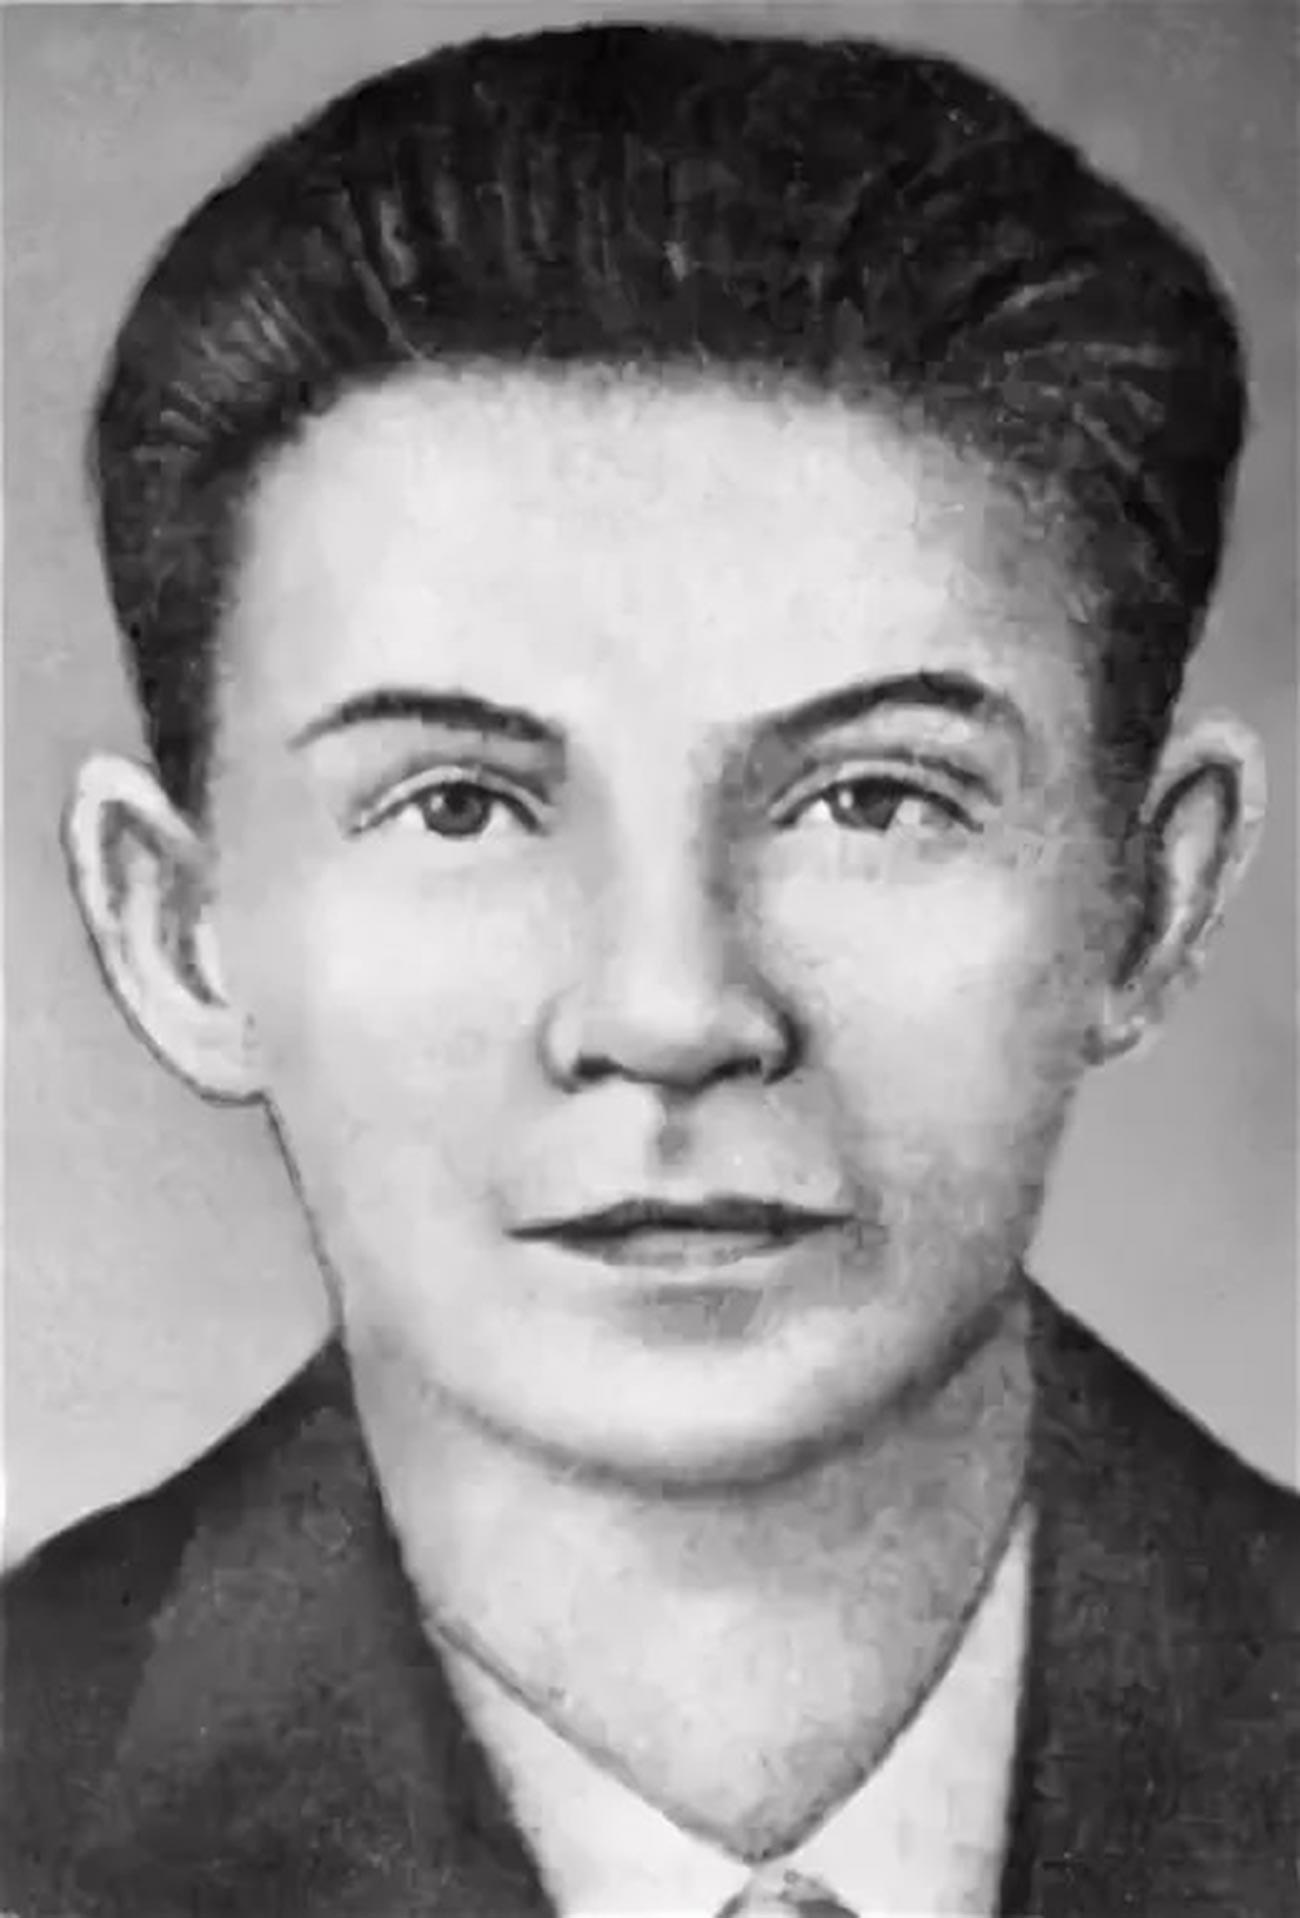 Junak Sovjetske zveze V. I. Jermak